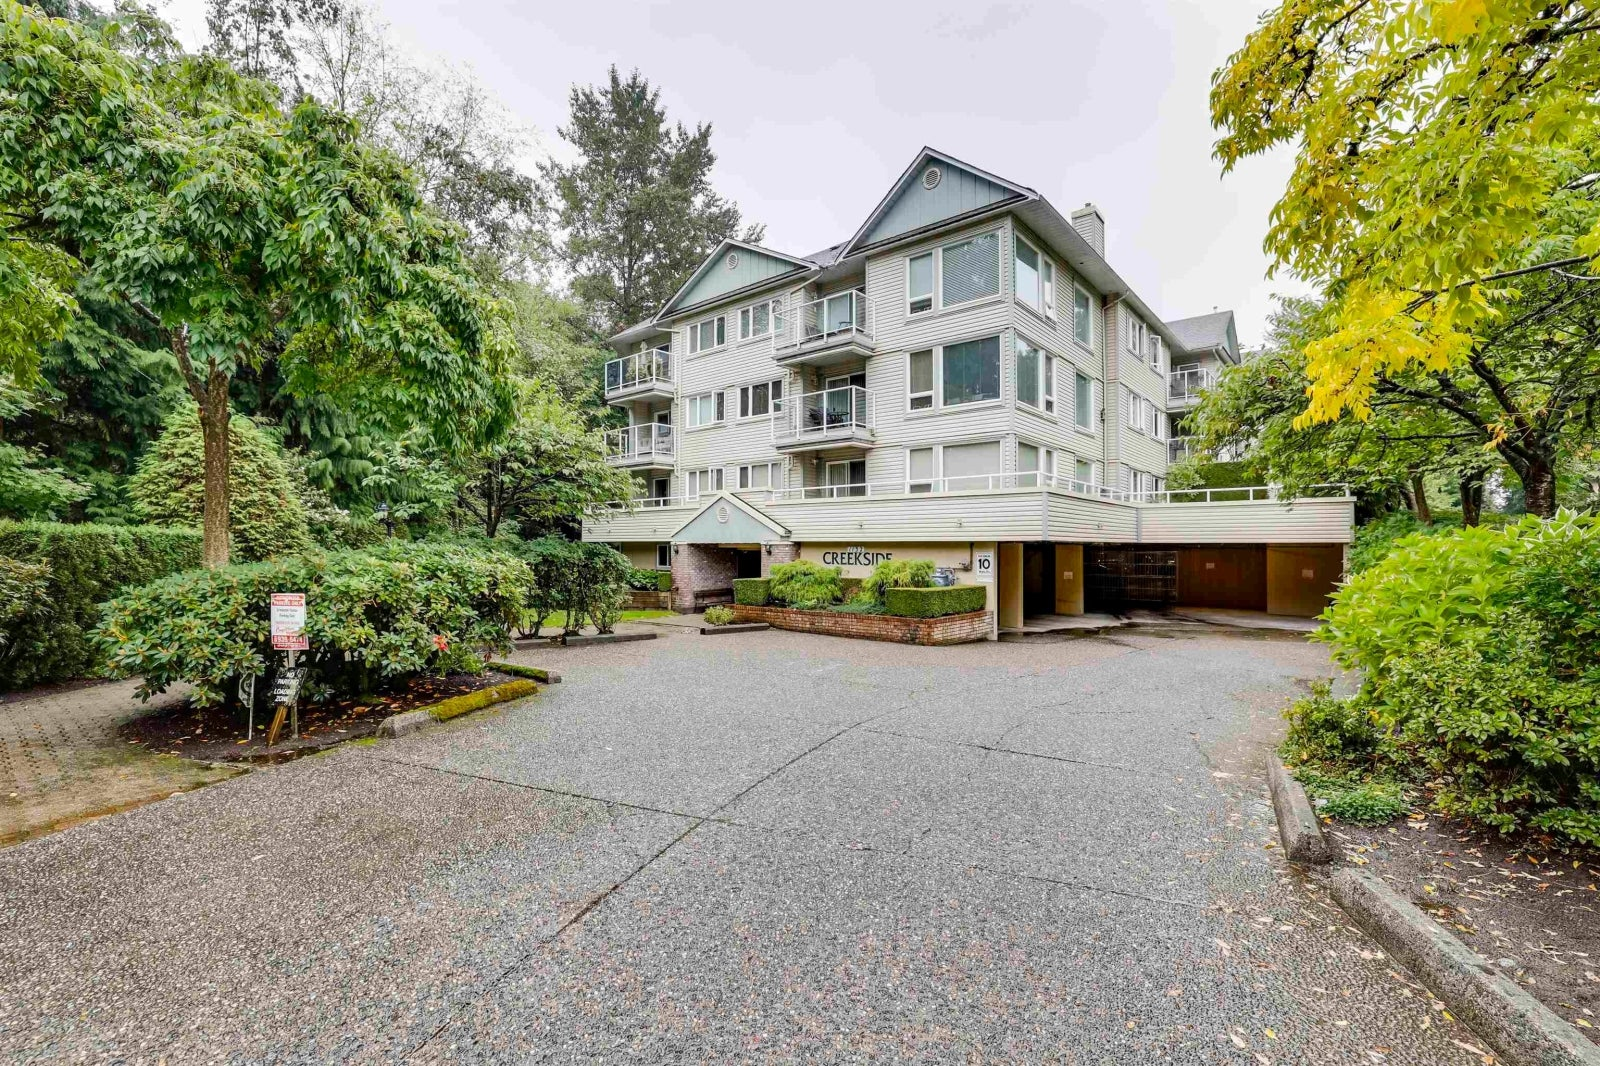 103 1132 DUFFERIN STREET - Eagle Ridge CQ Apartment/Condo for sale, 2 Bedrooms (R2618654) #1